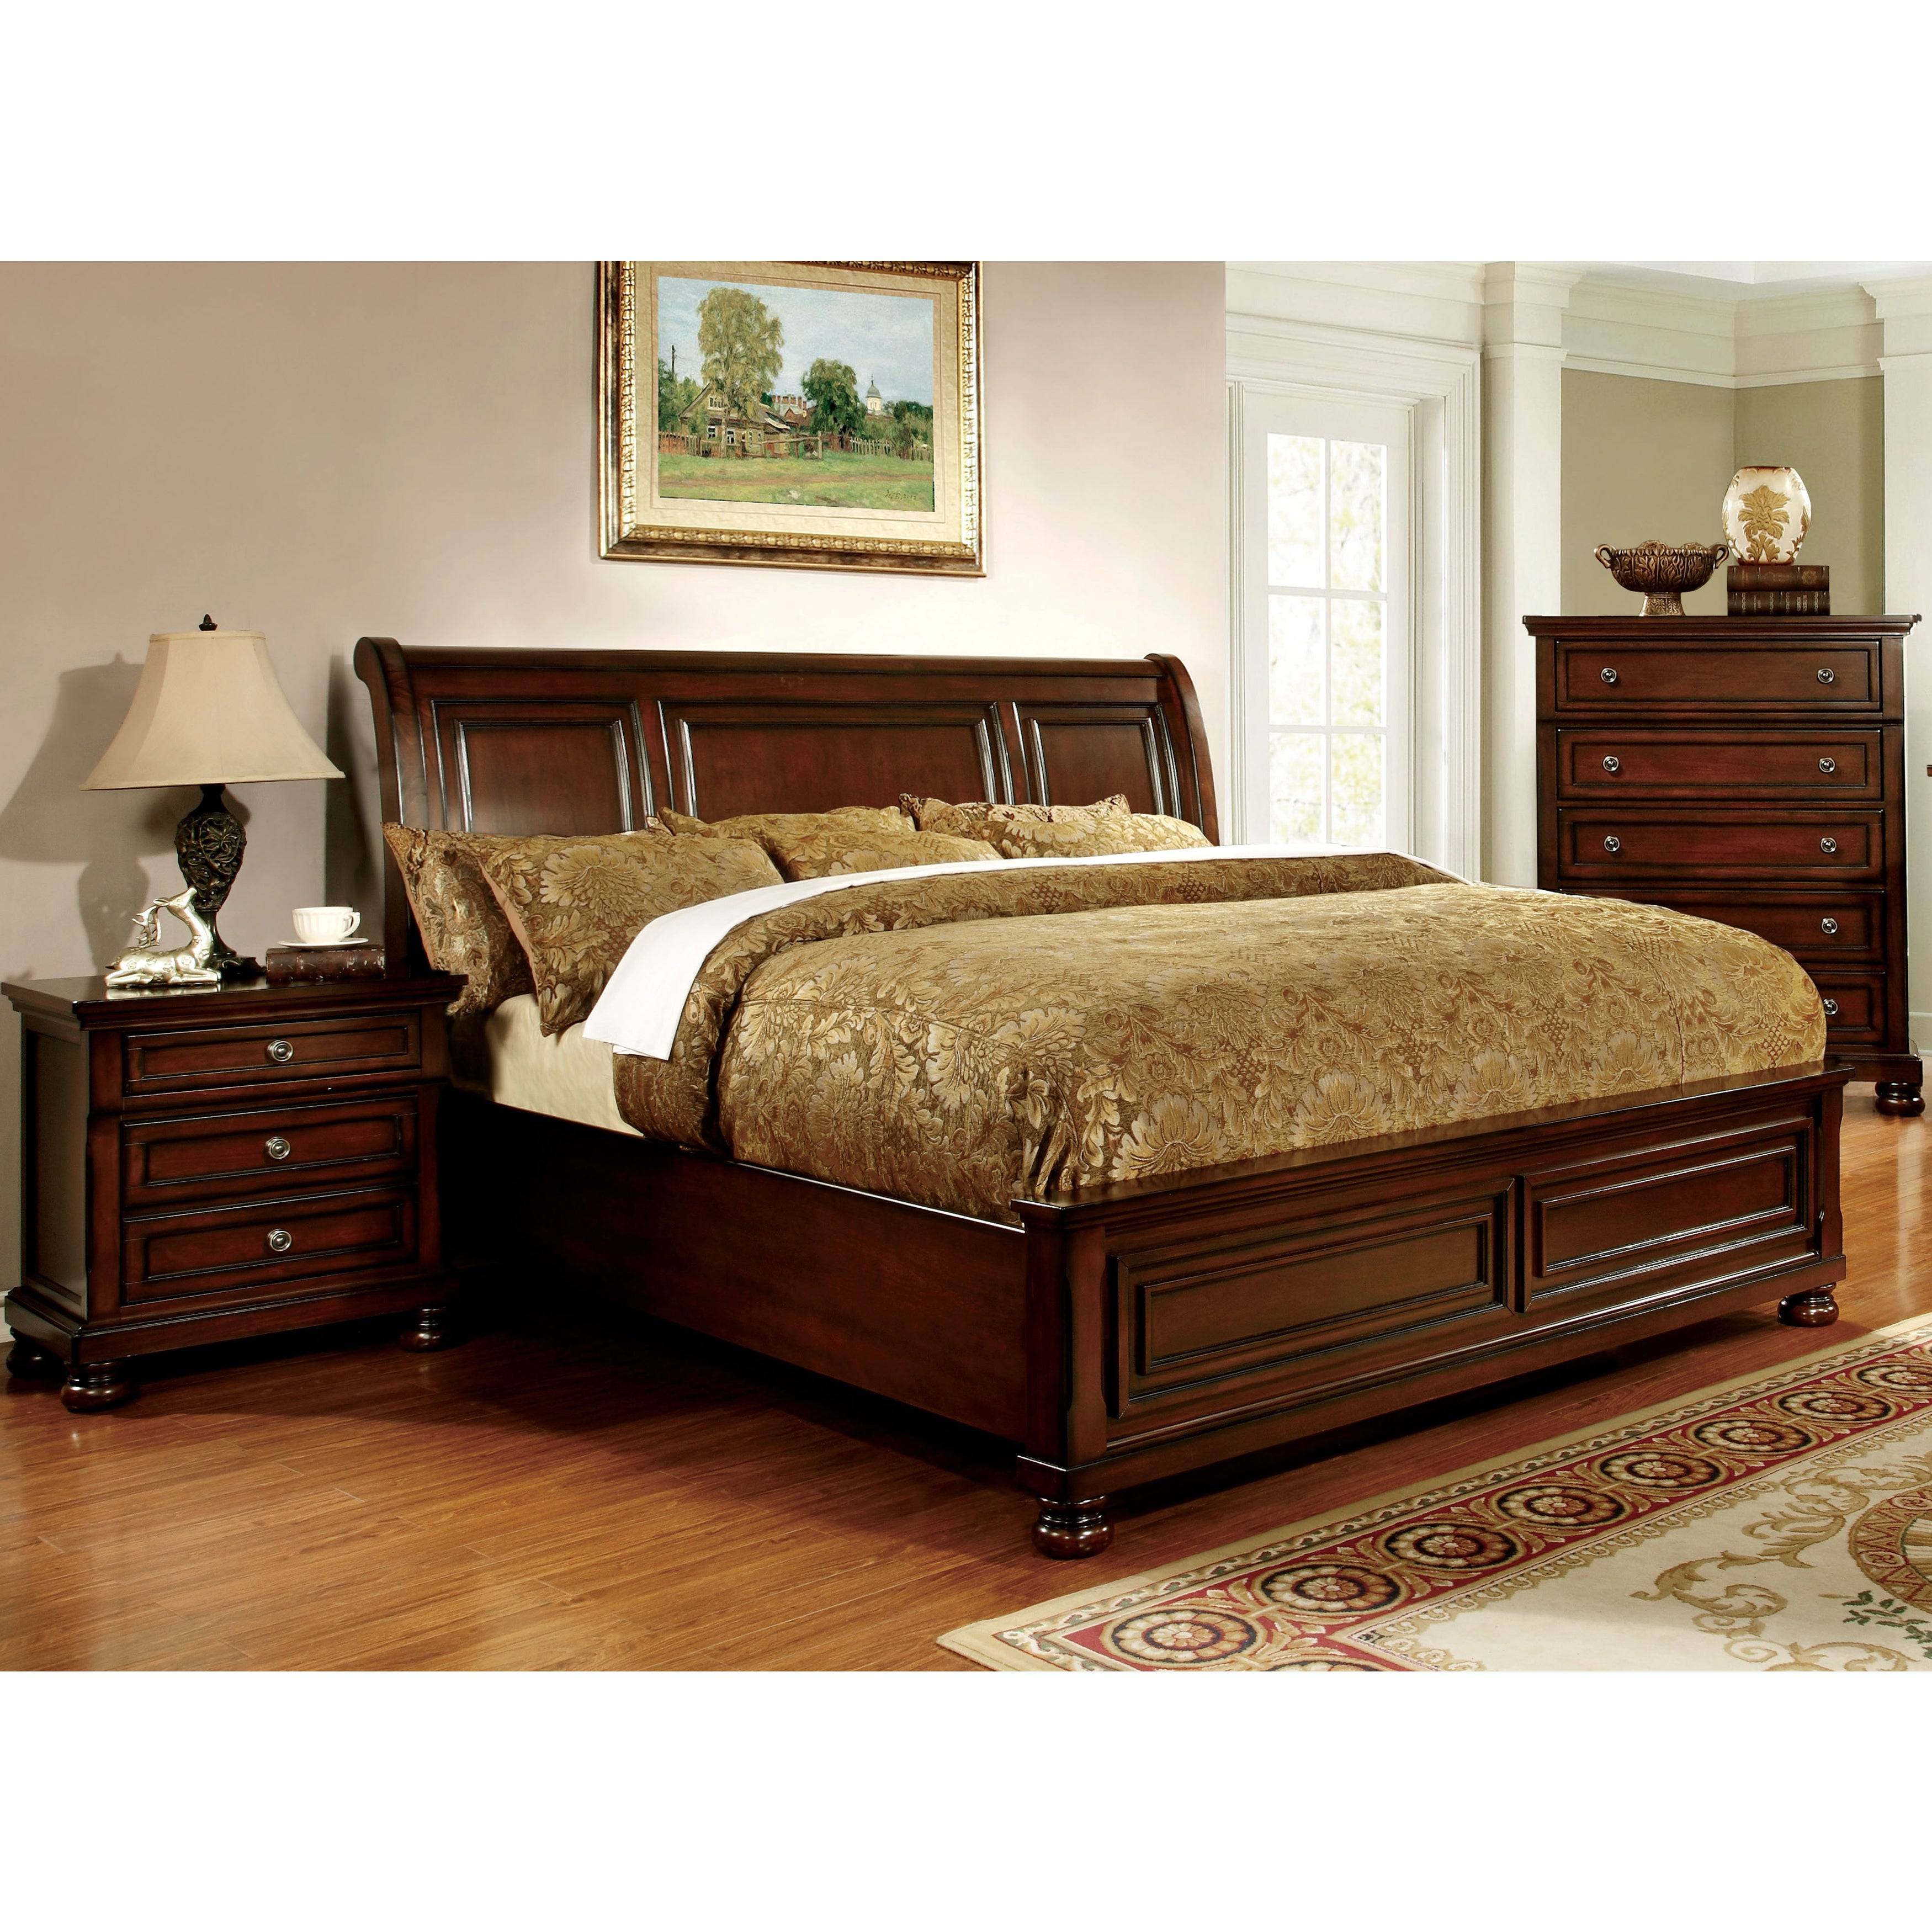 Furniture of America Barelle II Cherry 3-Piece Bedroom Set